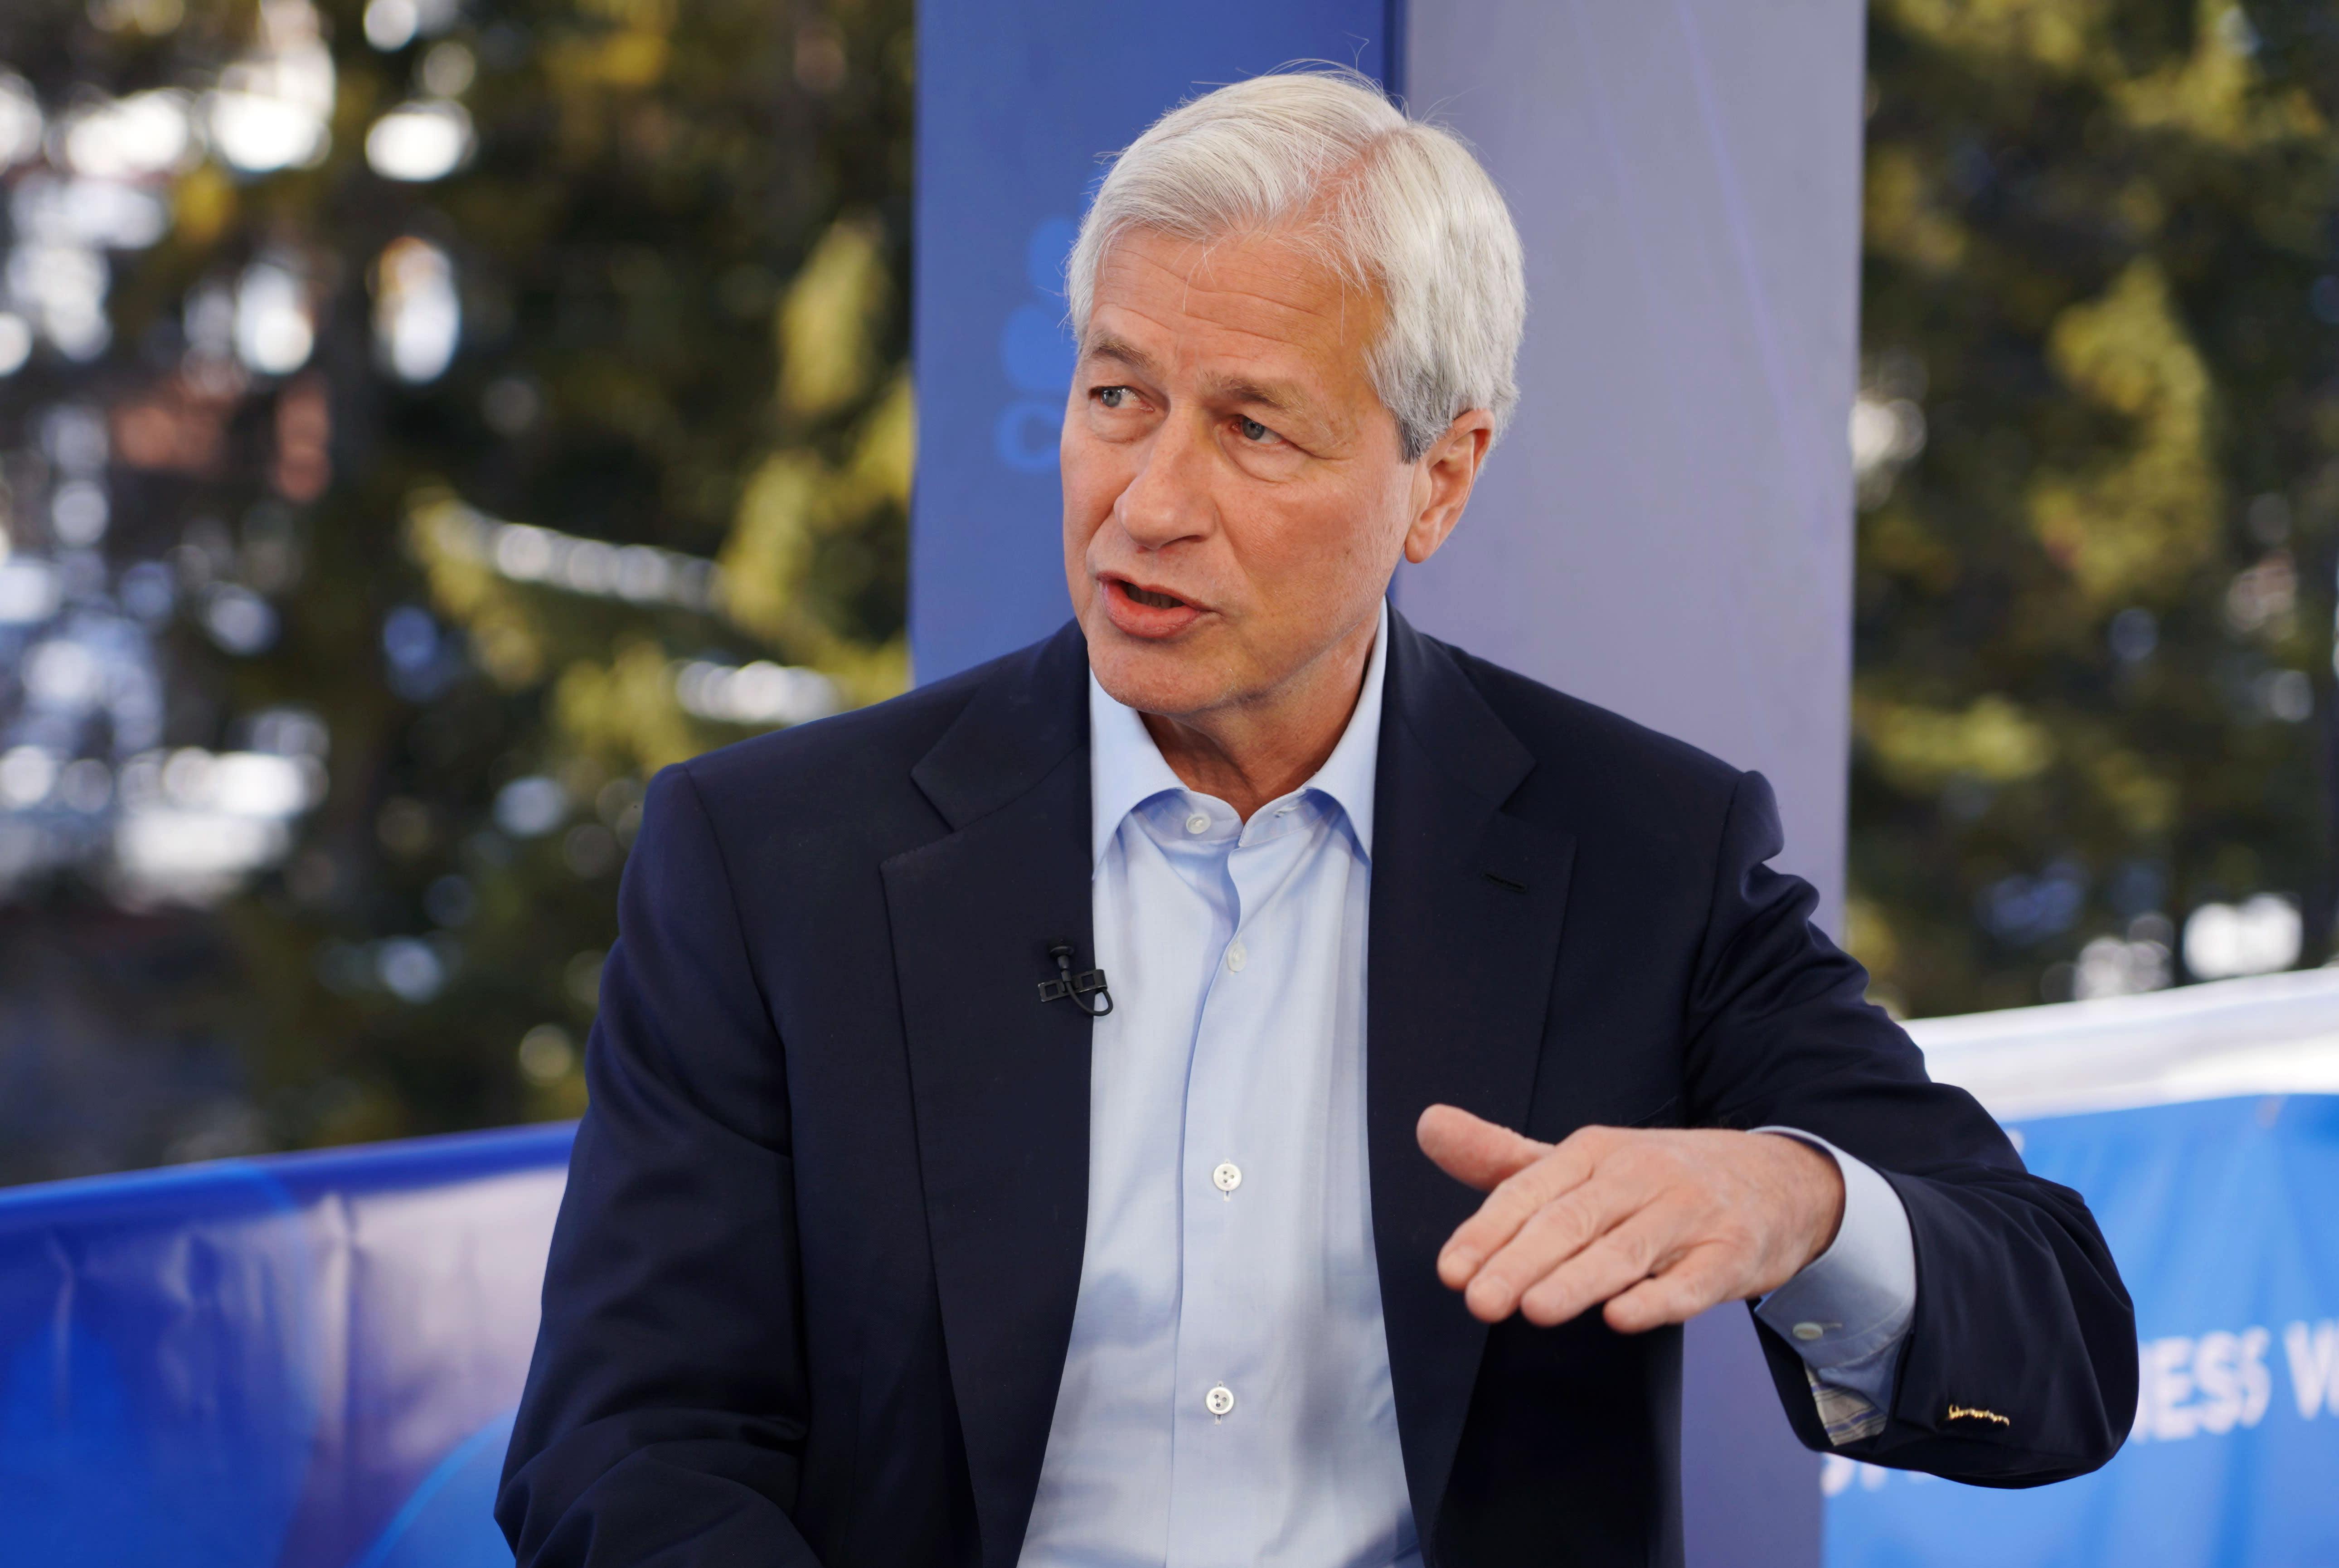 JPMorgan beats profit estimates on better-than-expected credit trading revenue – CNBC